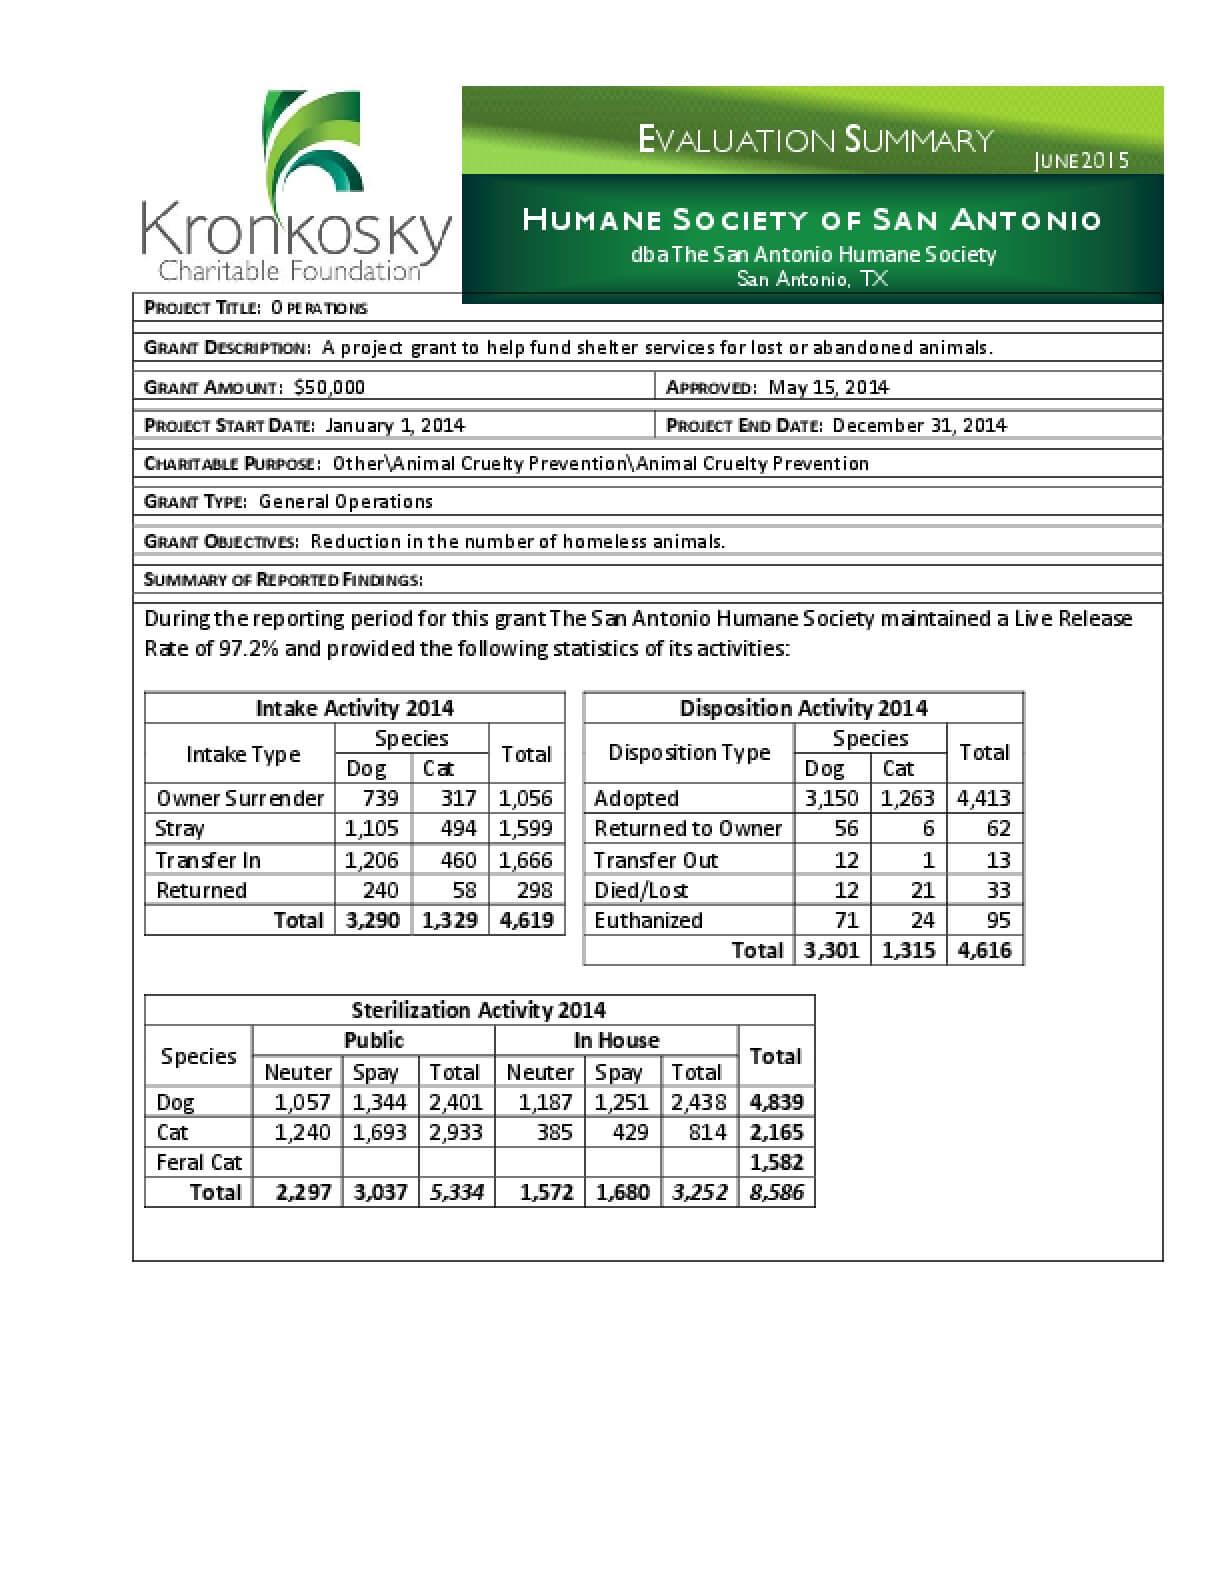 Humane Society of San Antonio Evaluation Summary